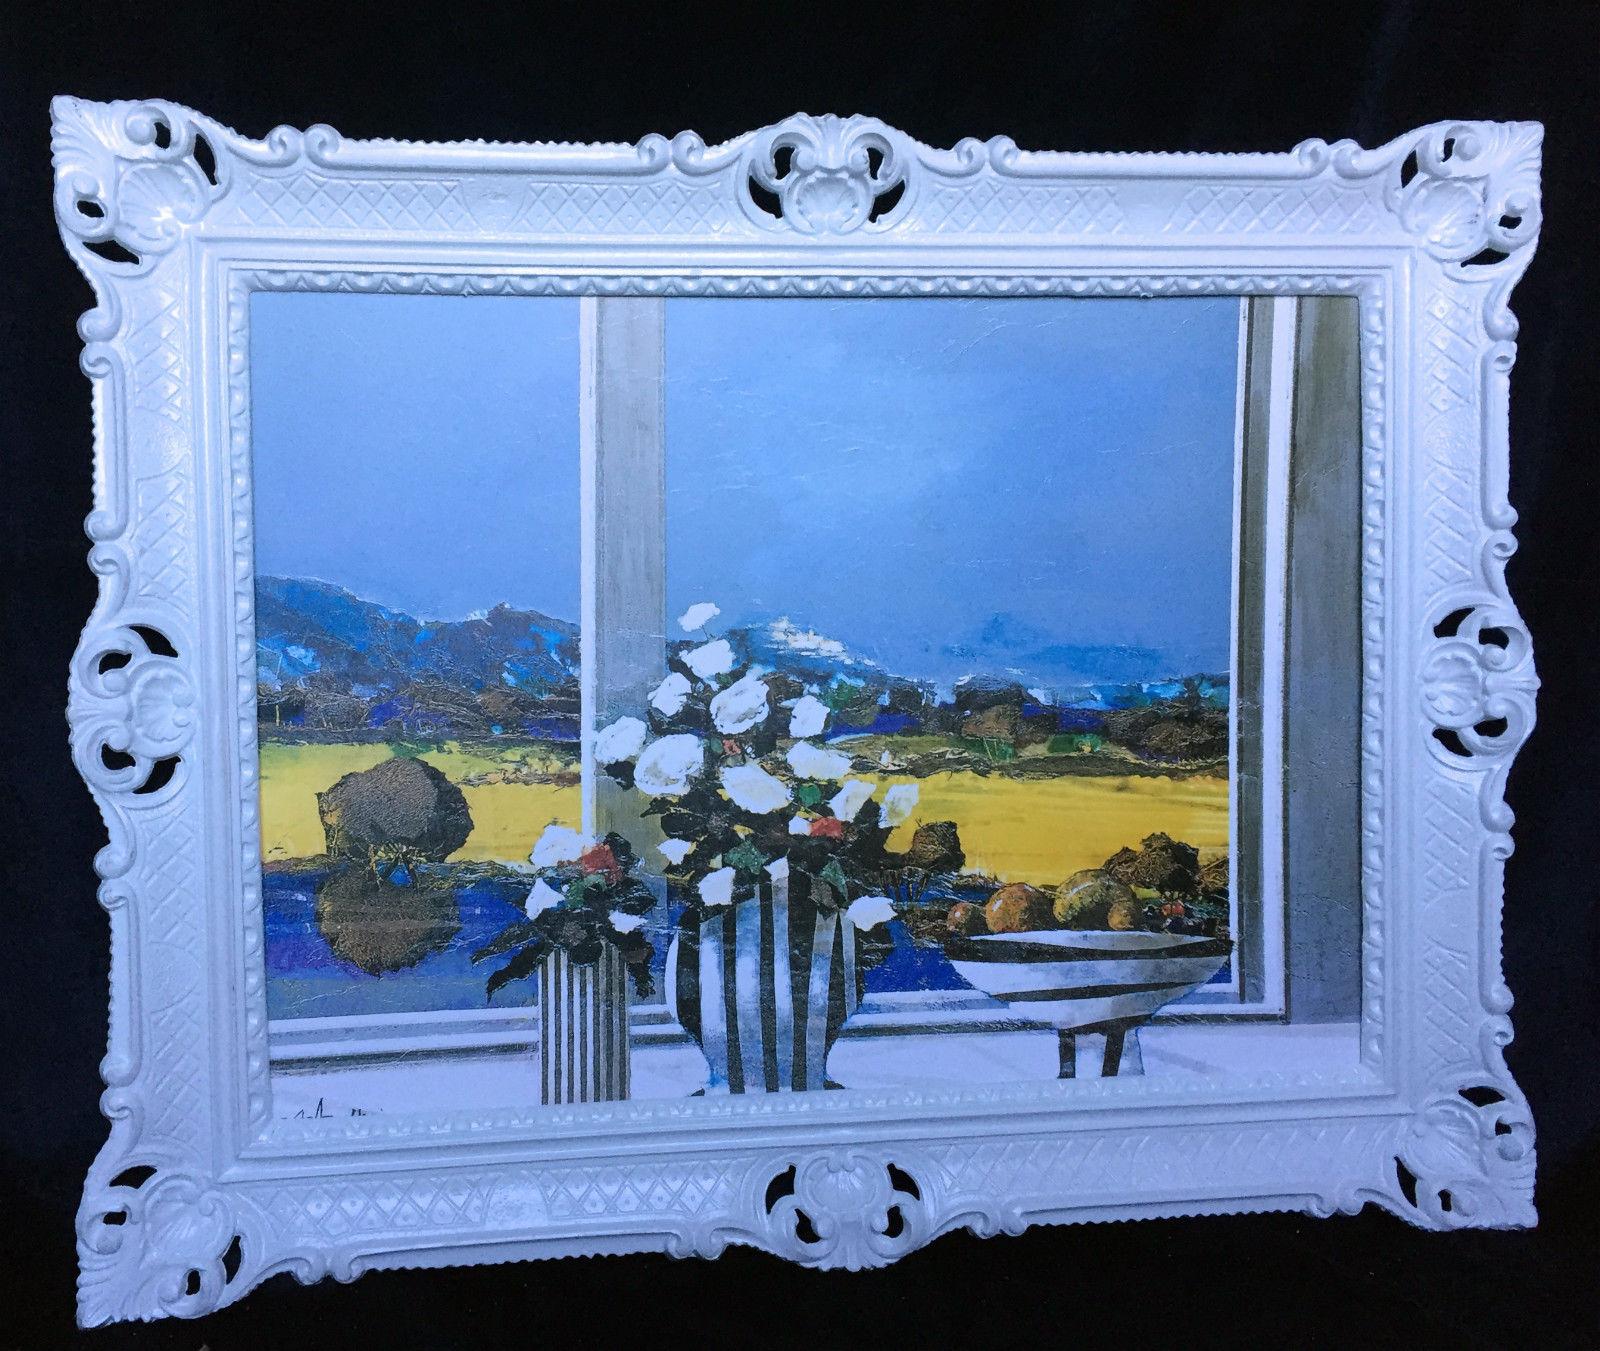 Gemälde Landschaftsbild 90x70 Blumen Bild gerahmte Gemälde Wandbild ...